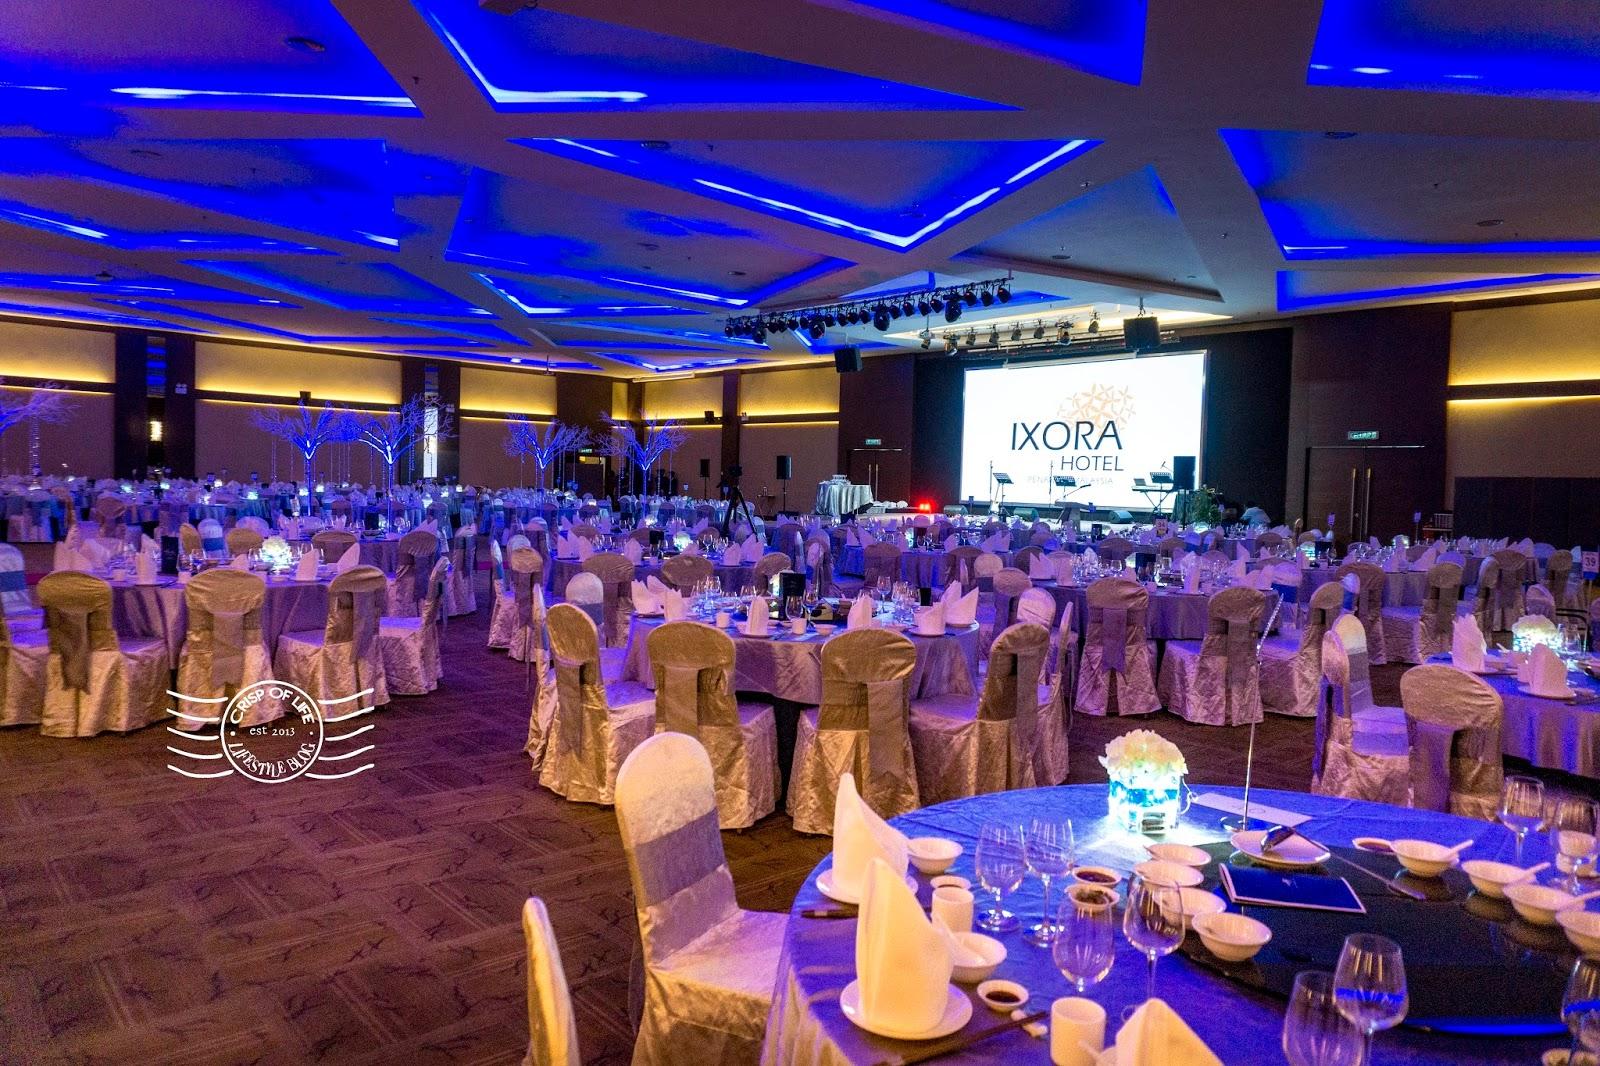 Sparks with Ixora II Corporate Appreciation Night @ Ixora Hotel, Penang